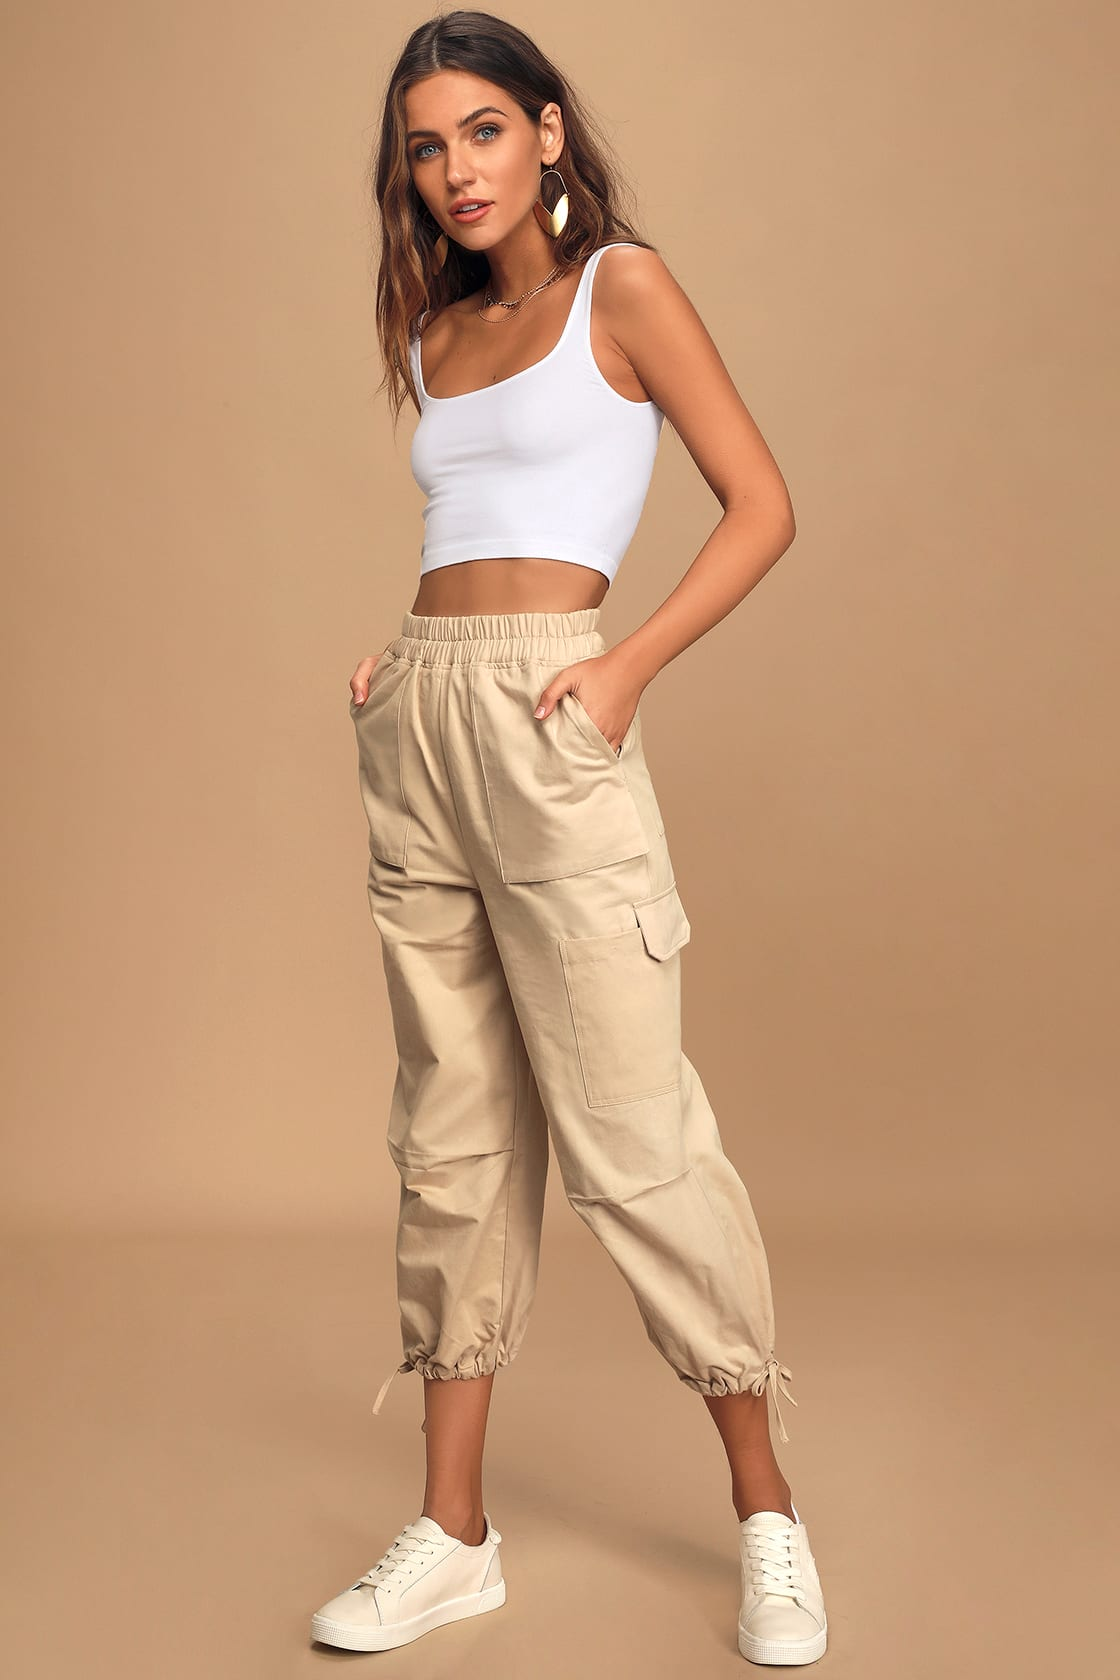 Crop top and Cargo Pants